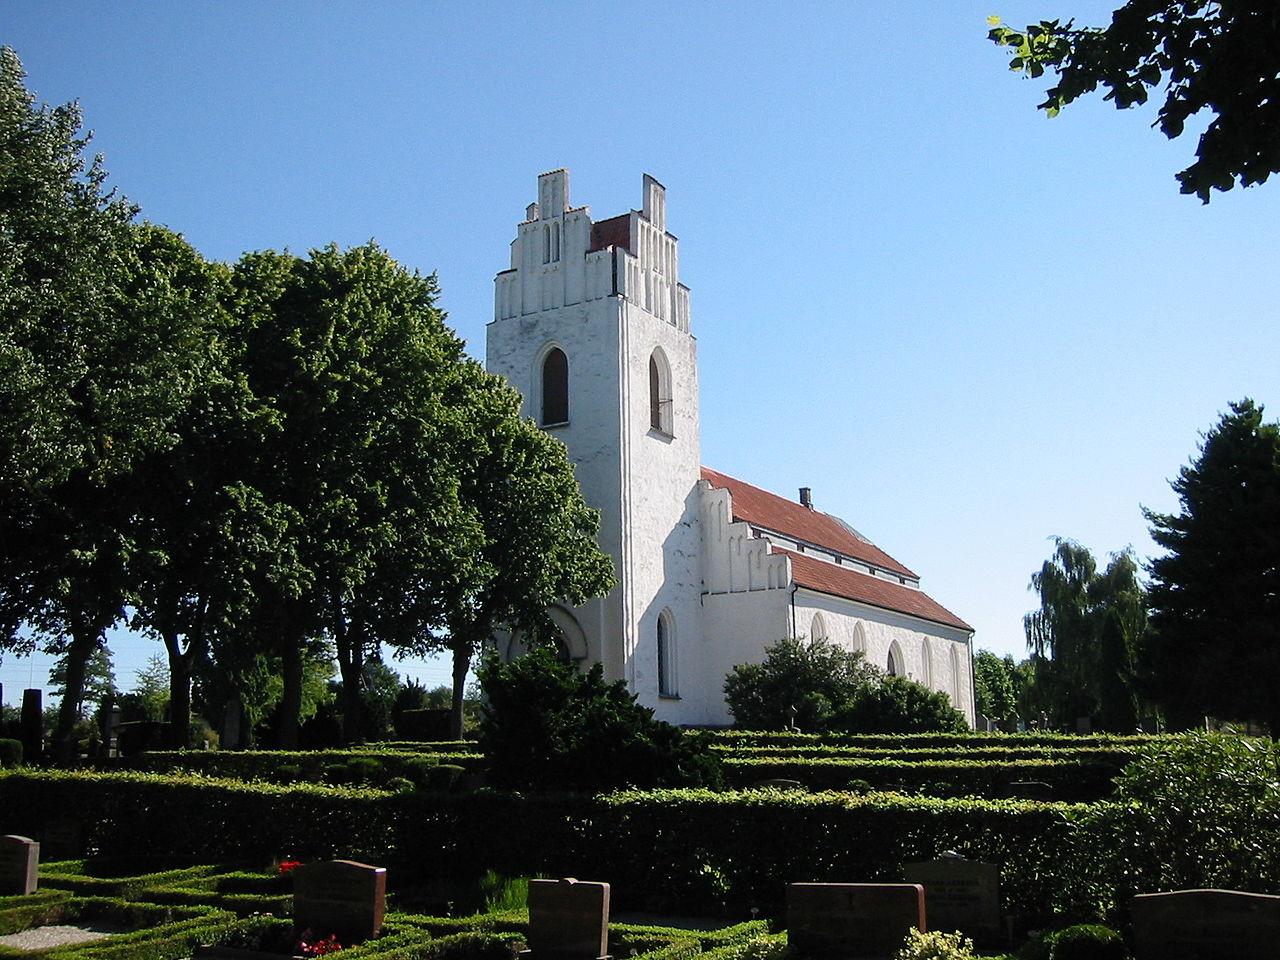 Billeberga-sireköpinge dating sweden